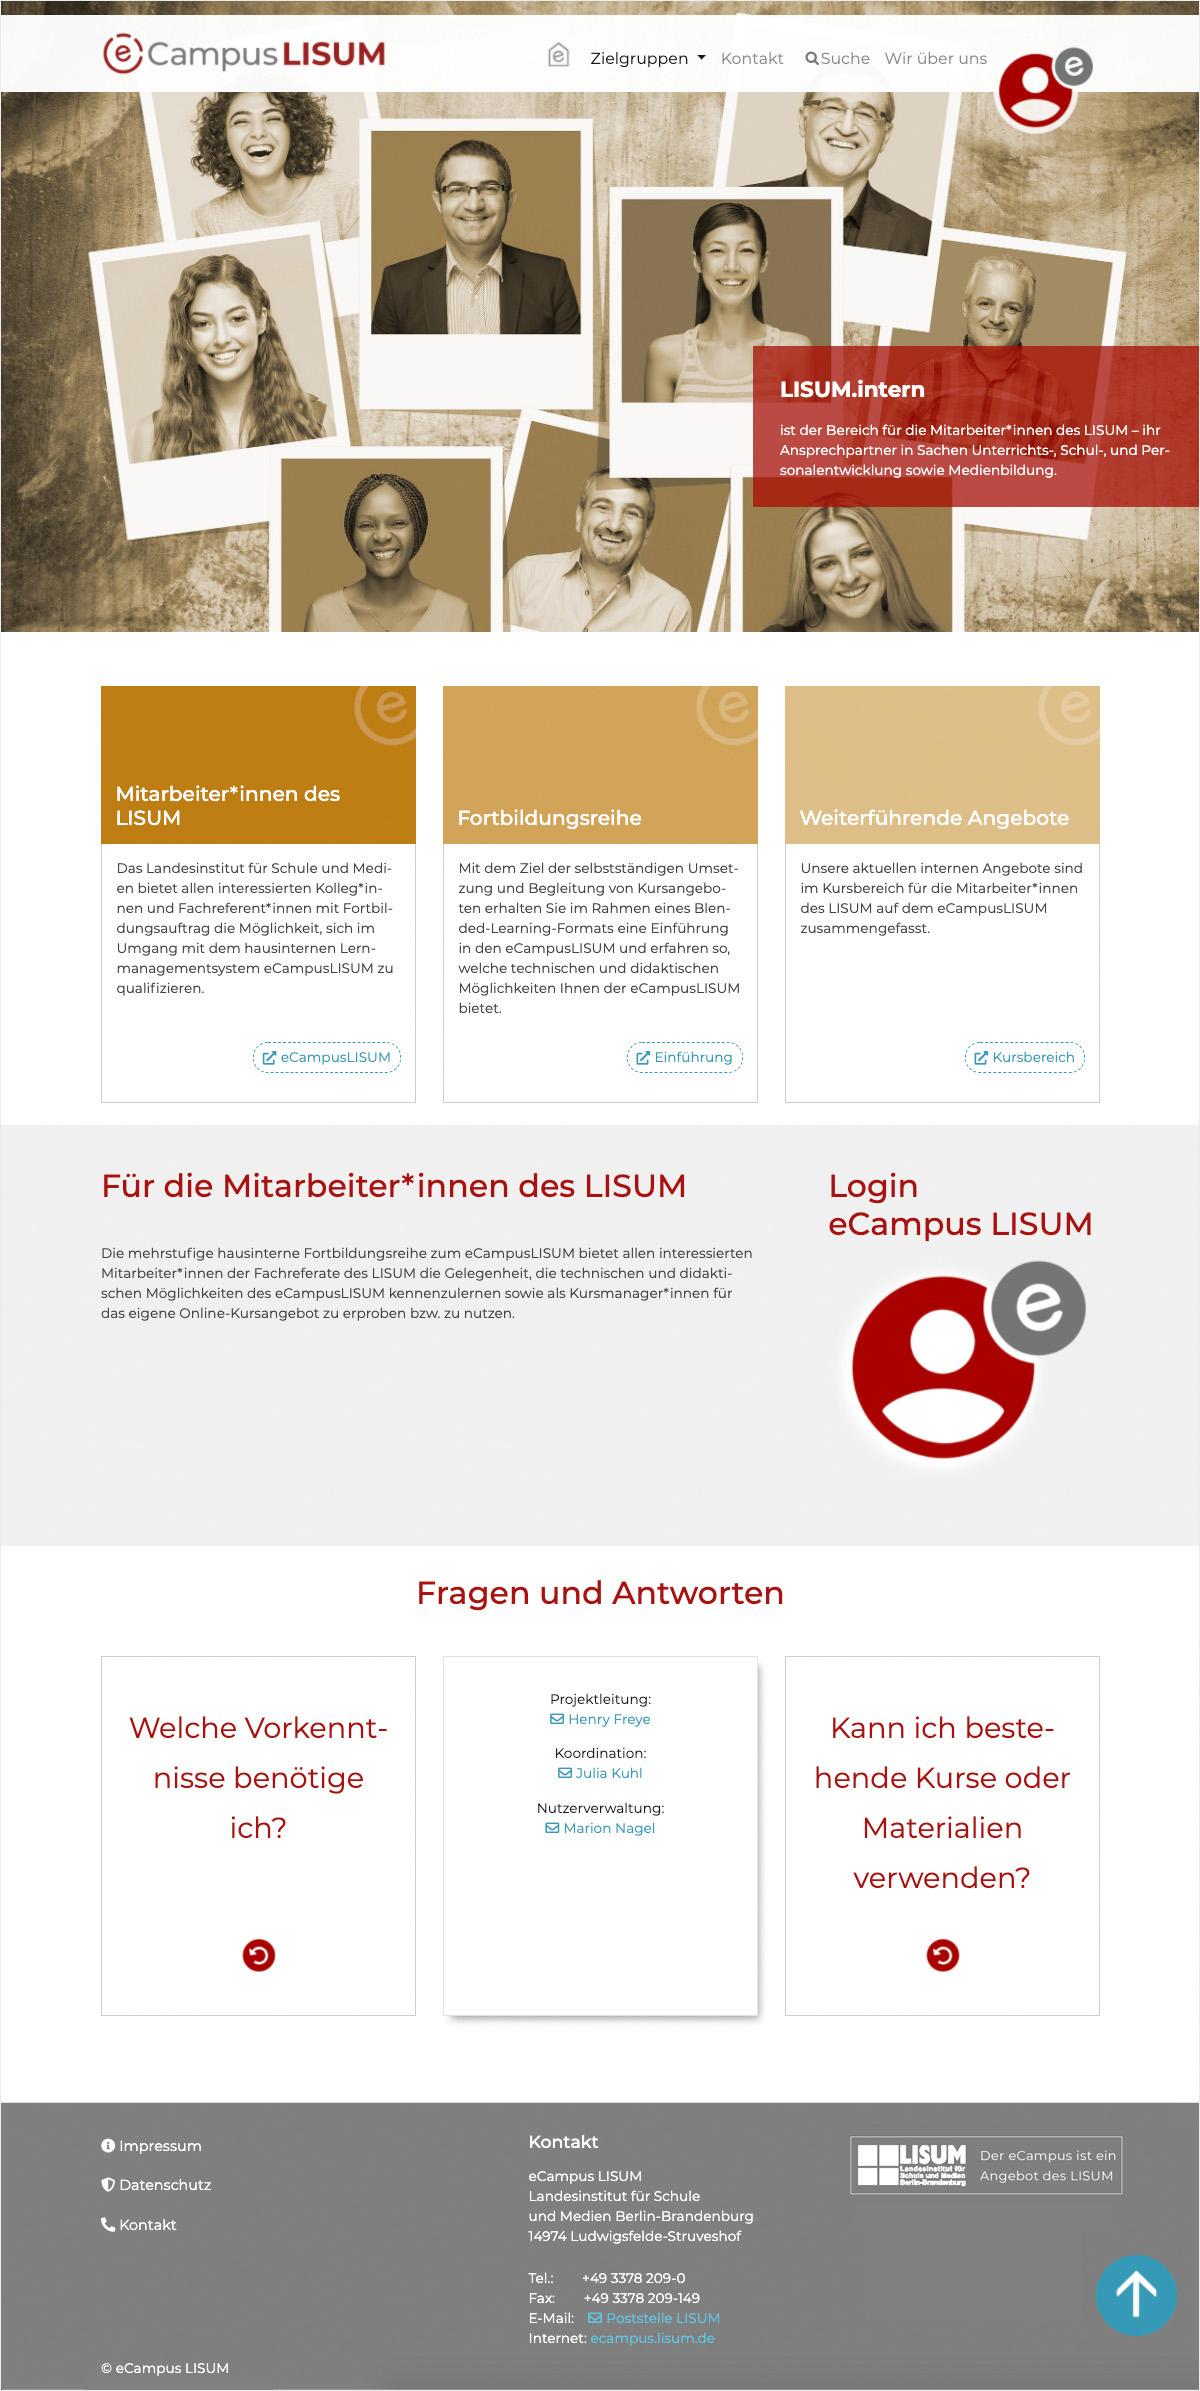 eCampus LISUM - intern